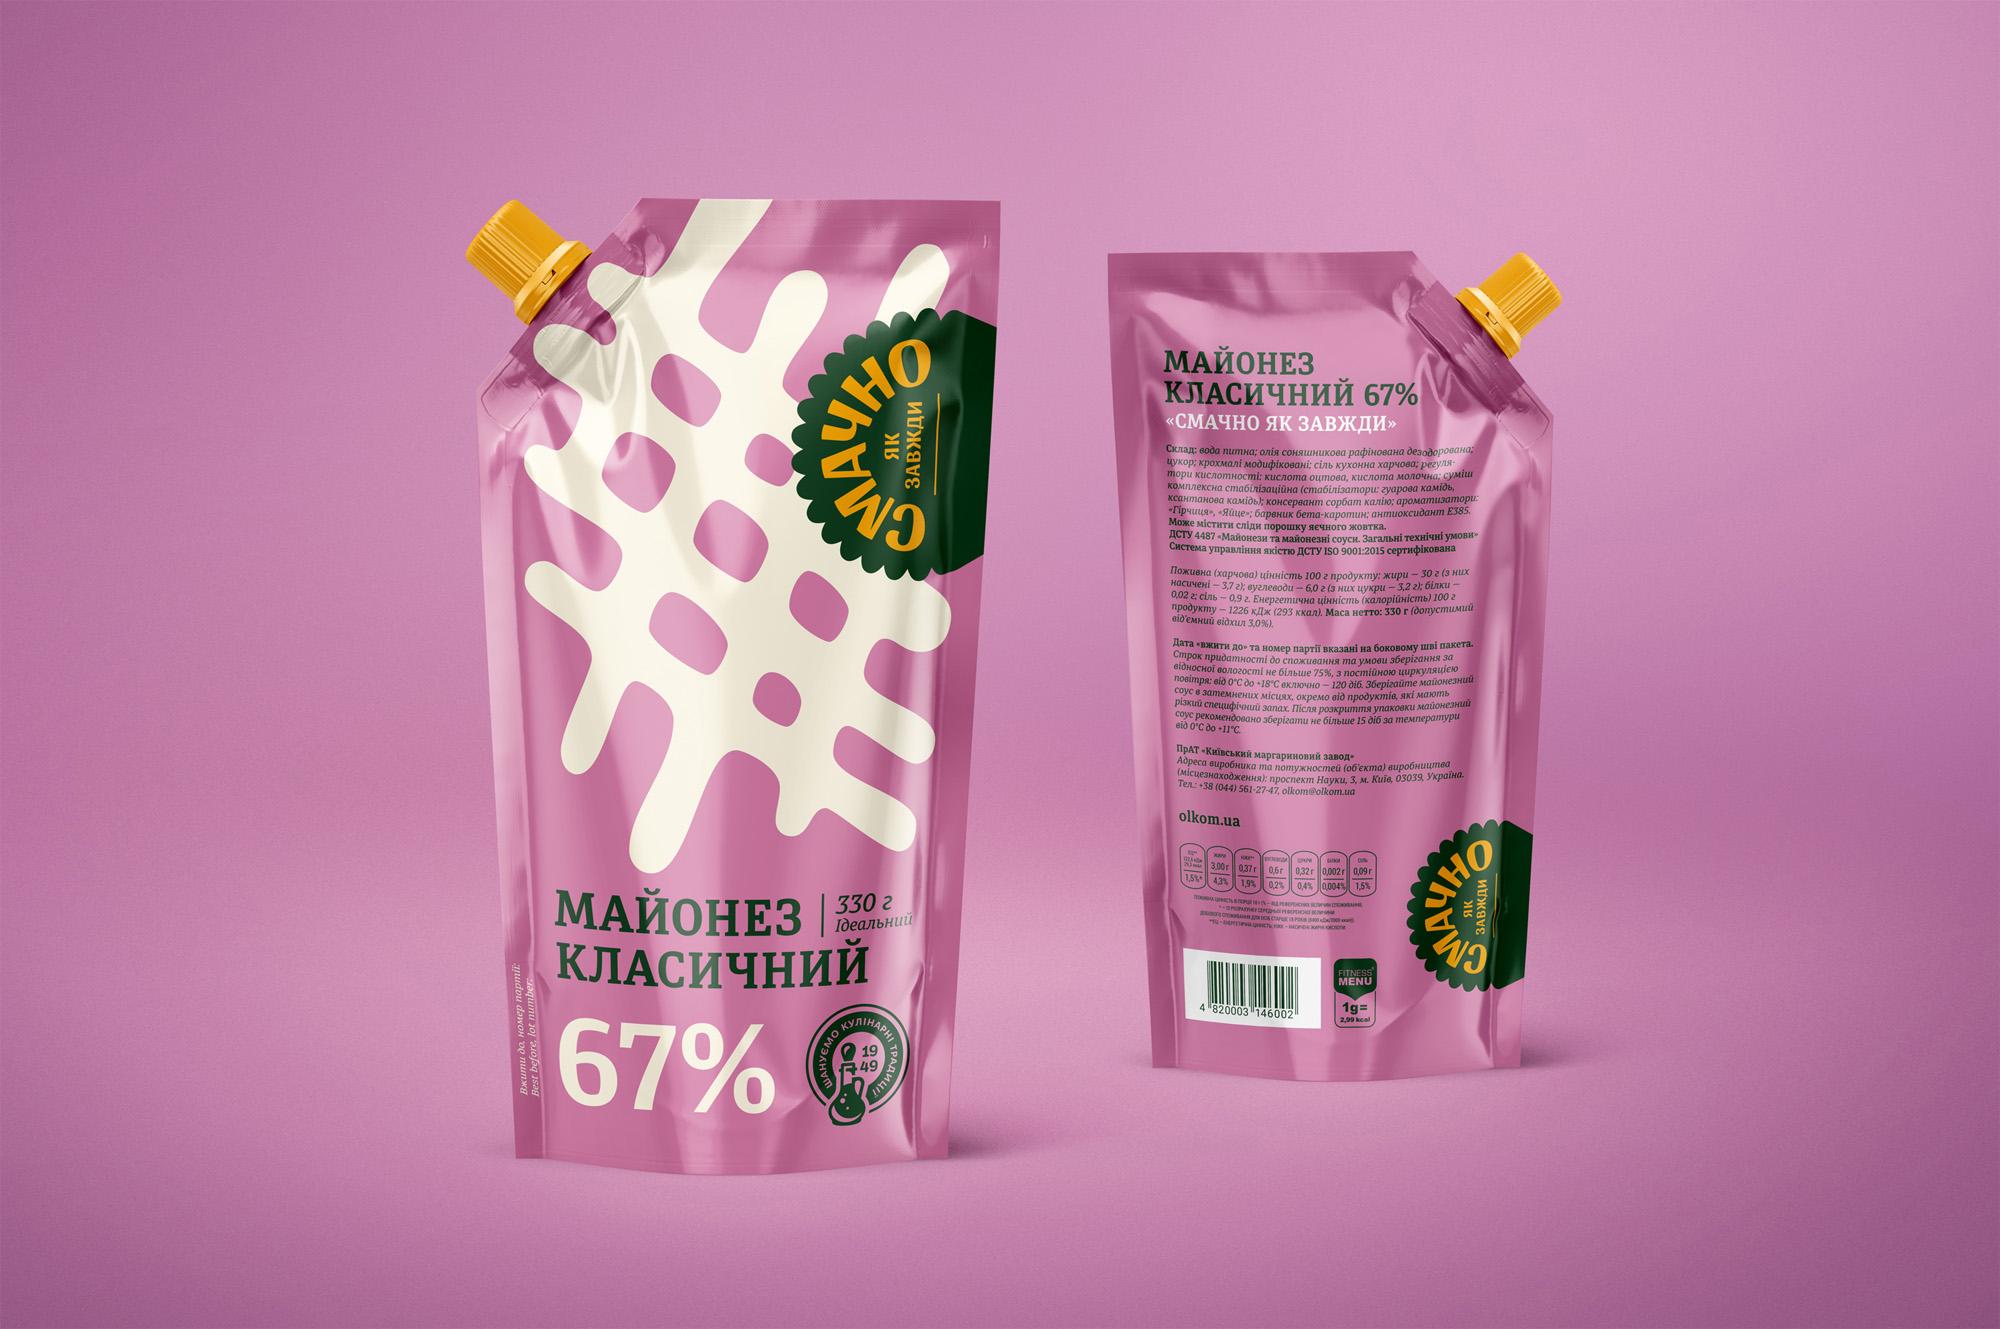 Packaging Design for Ukrainian Brand Tasty As Always Created by Gutsulyak Studio